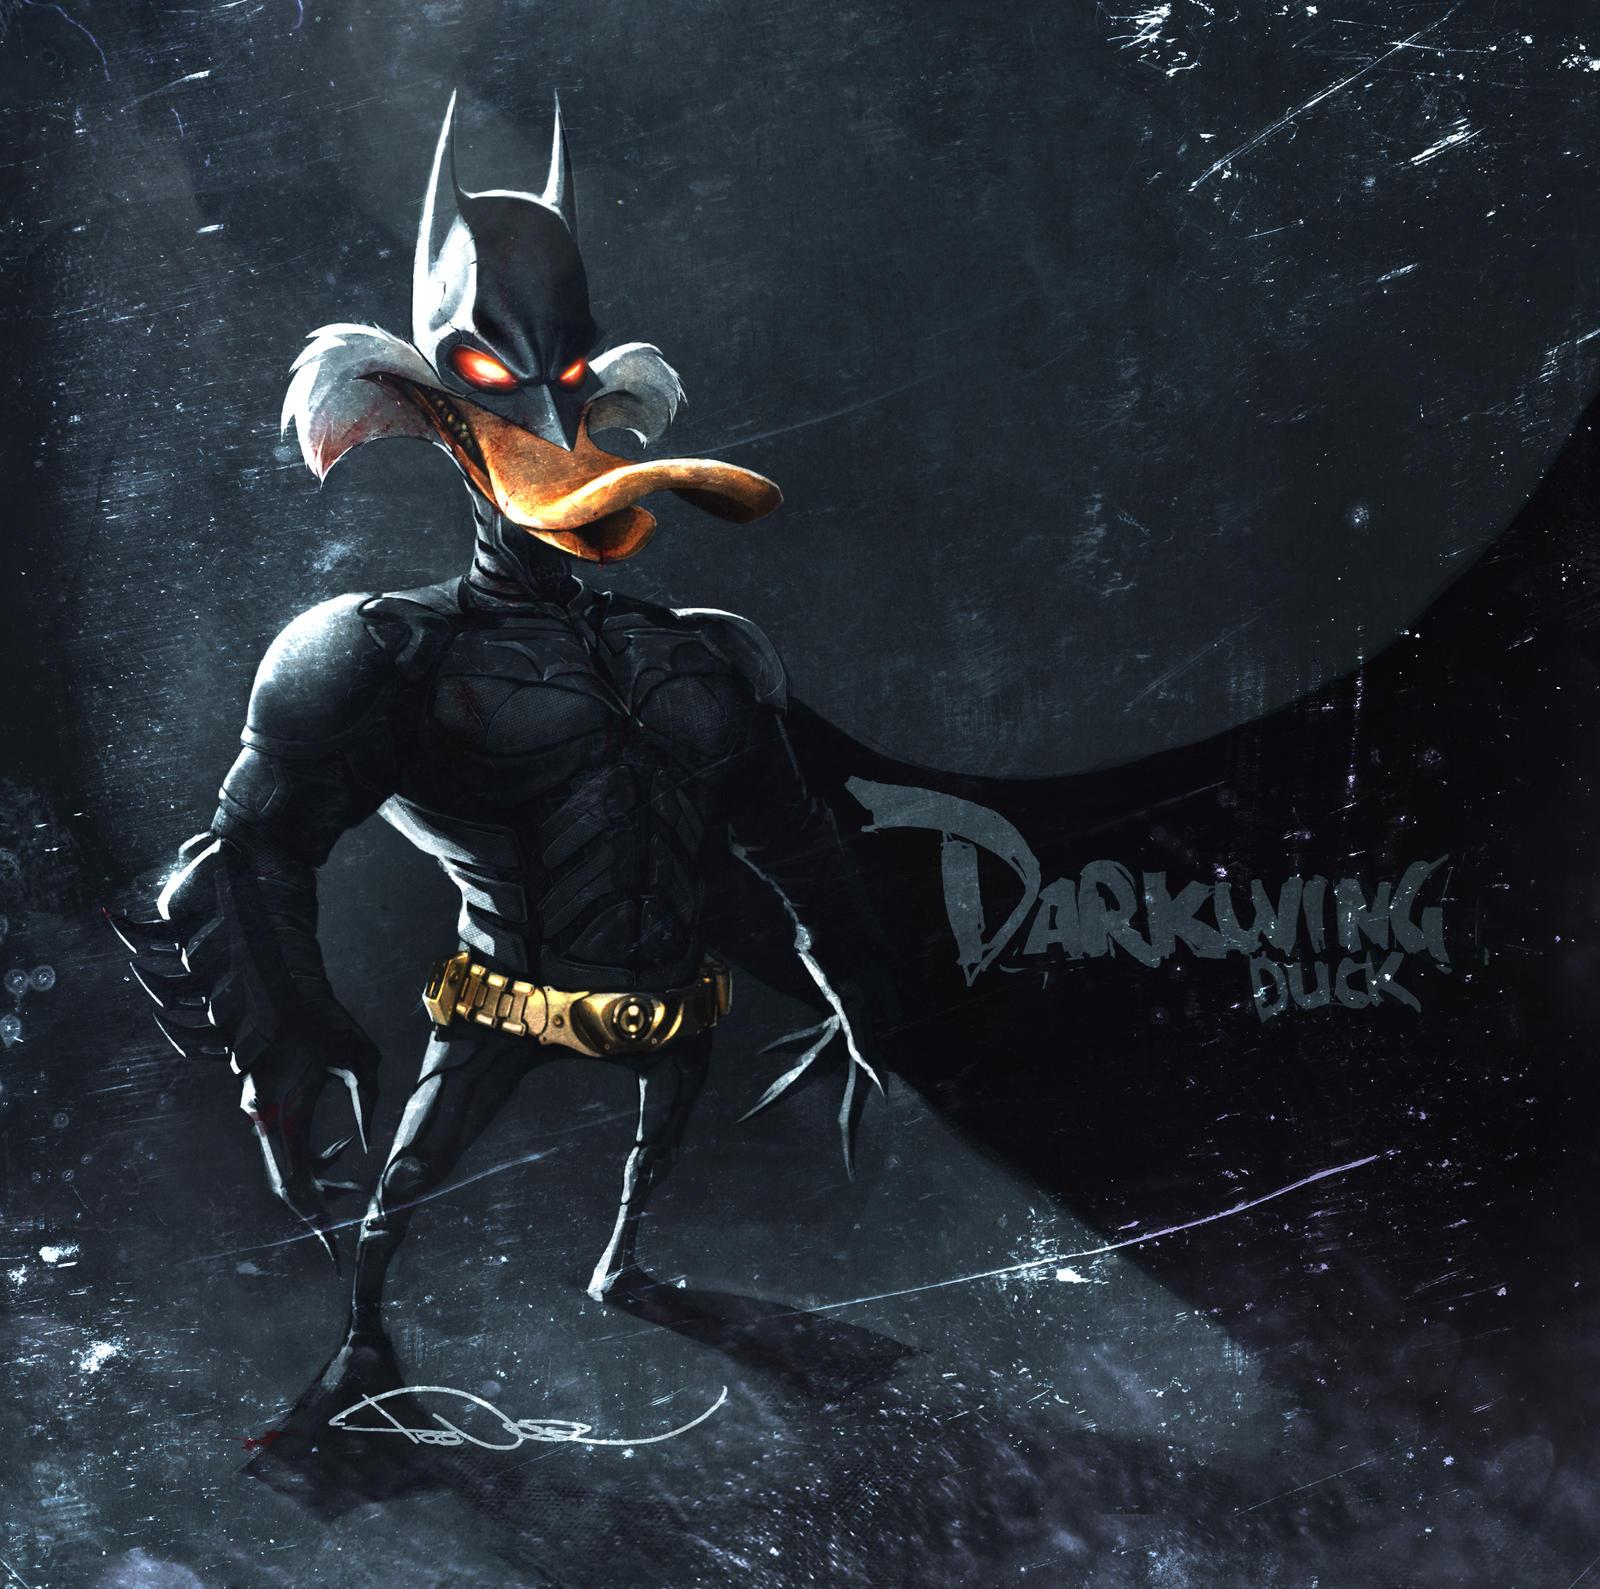 DarkKnightDuck by tooDeee